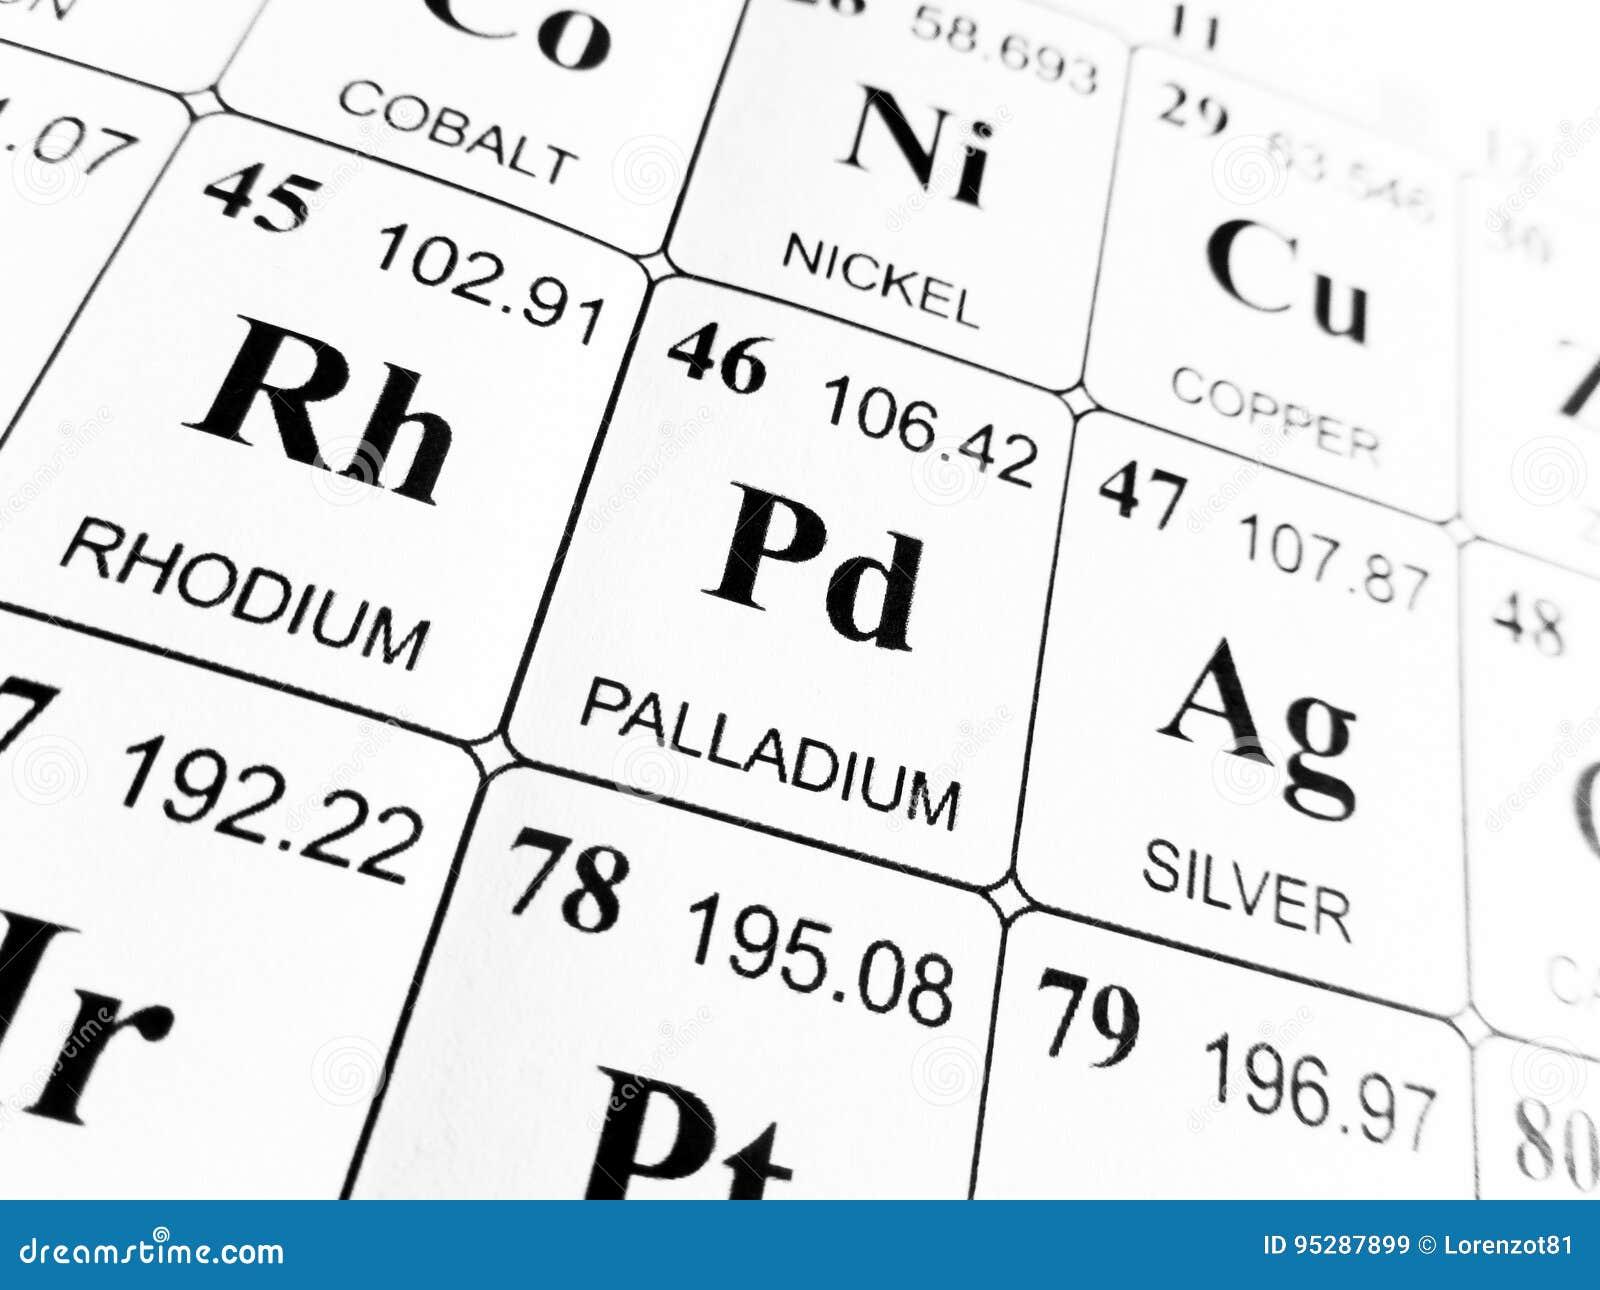 Palladium on the periodic table of the elements stock image image download palladium on the periodic table of the elements stock image image of elements urtaz Images